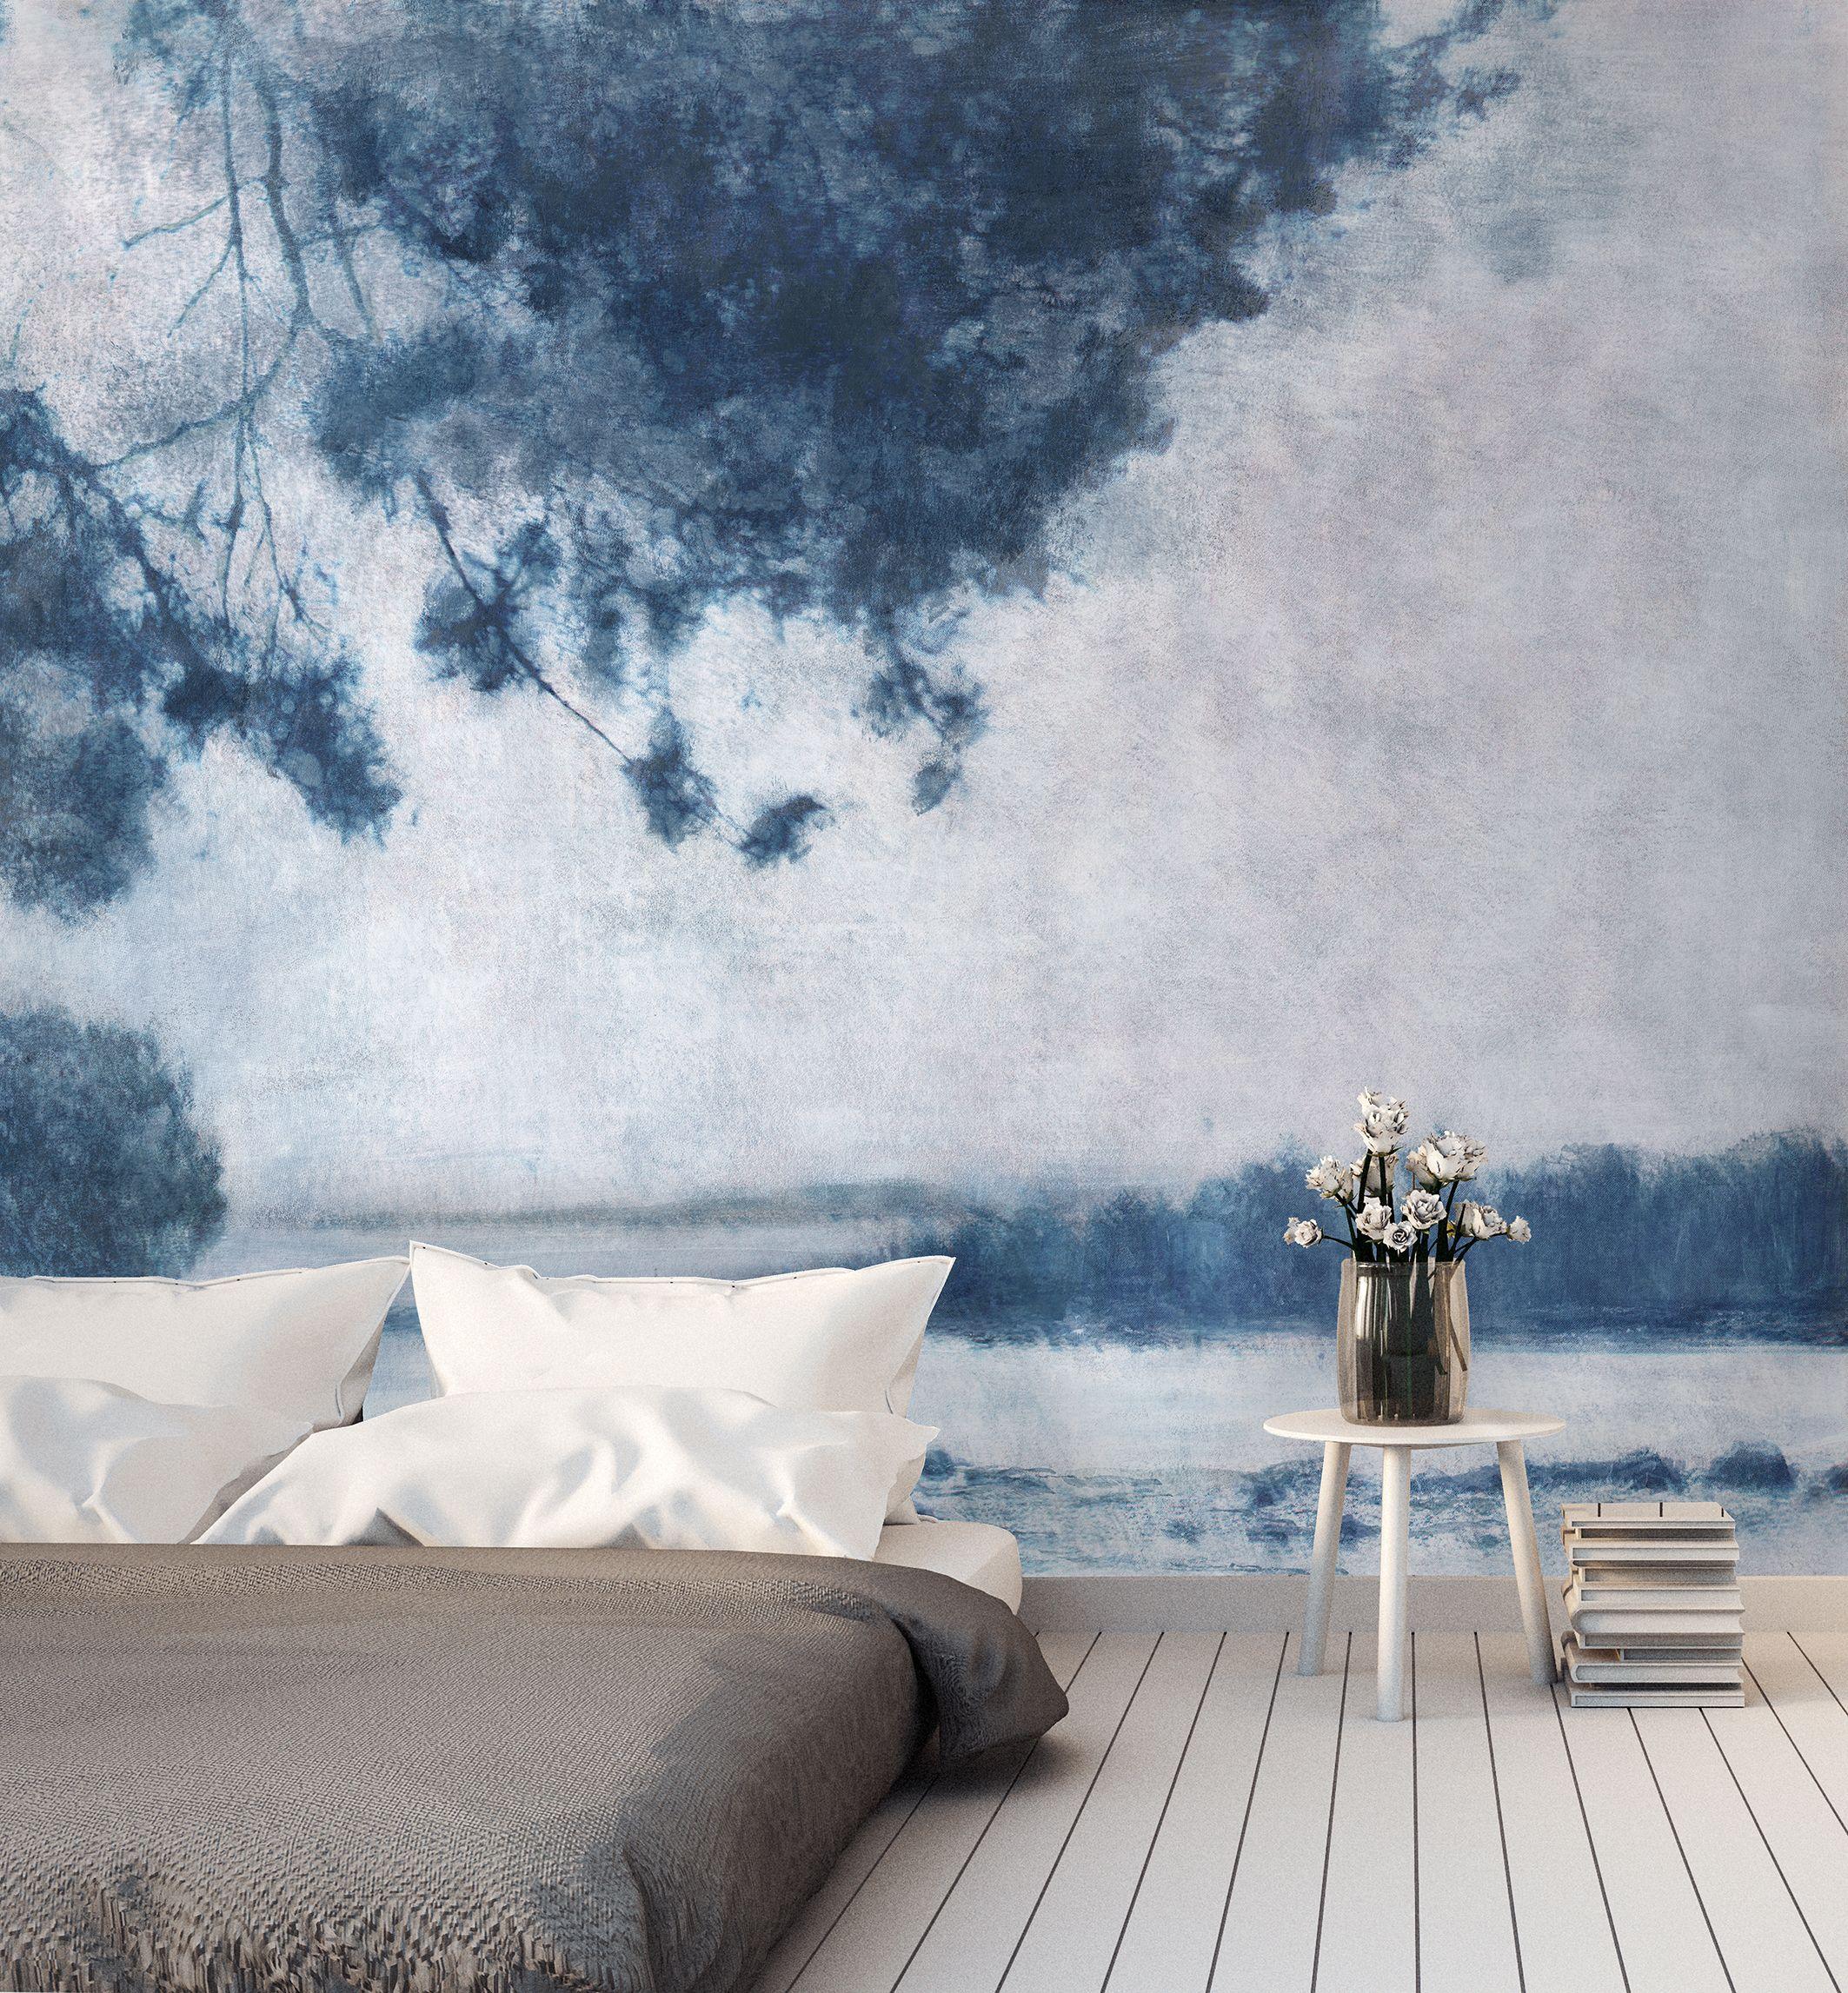 legend royal wallpaper tenue de ville collection ode tenue de ville in 2019 pinterest. Black Bedroom Furniture Sets. Home Design Ideas